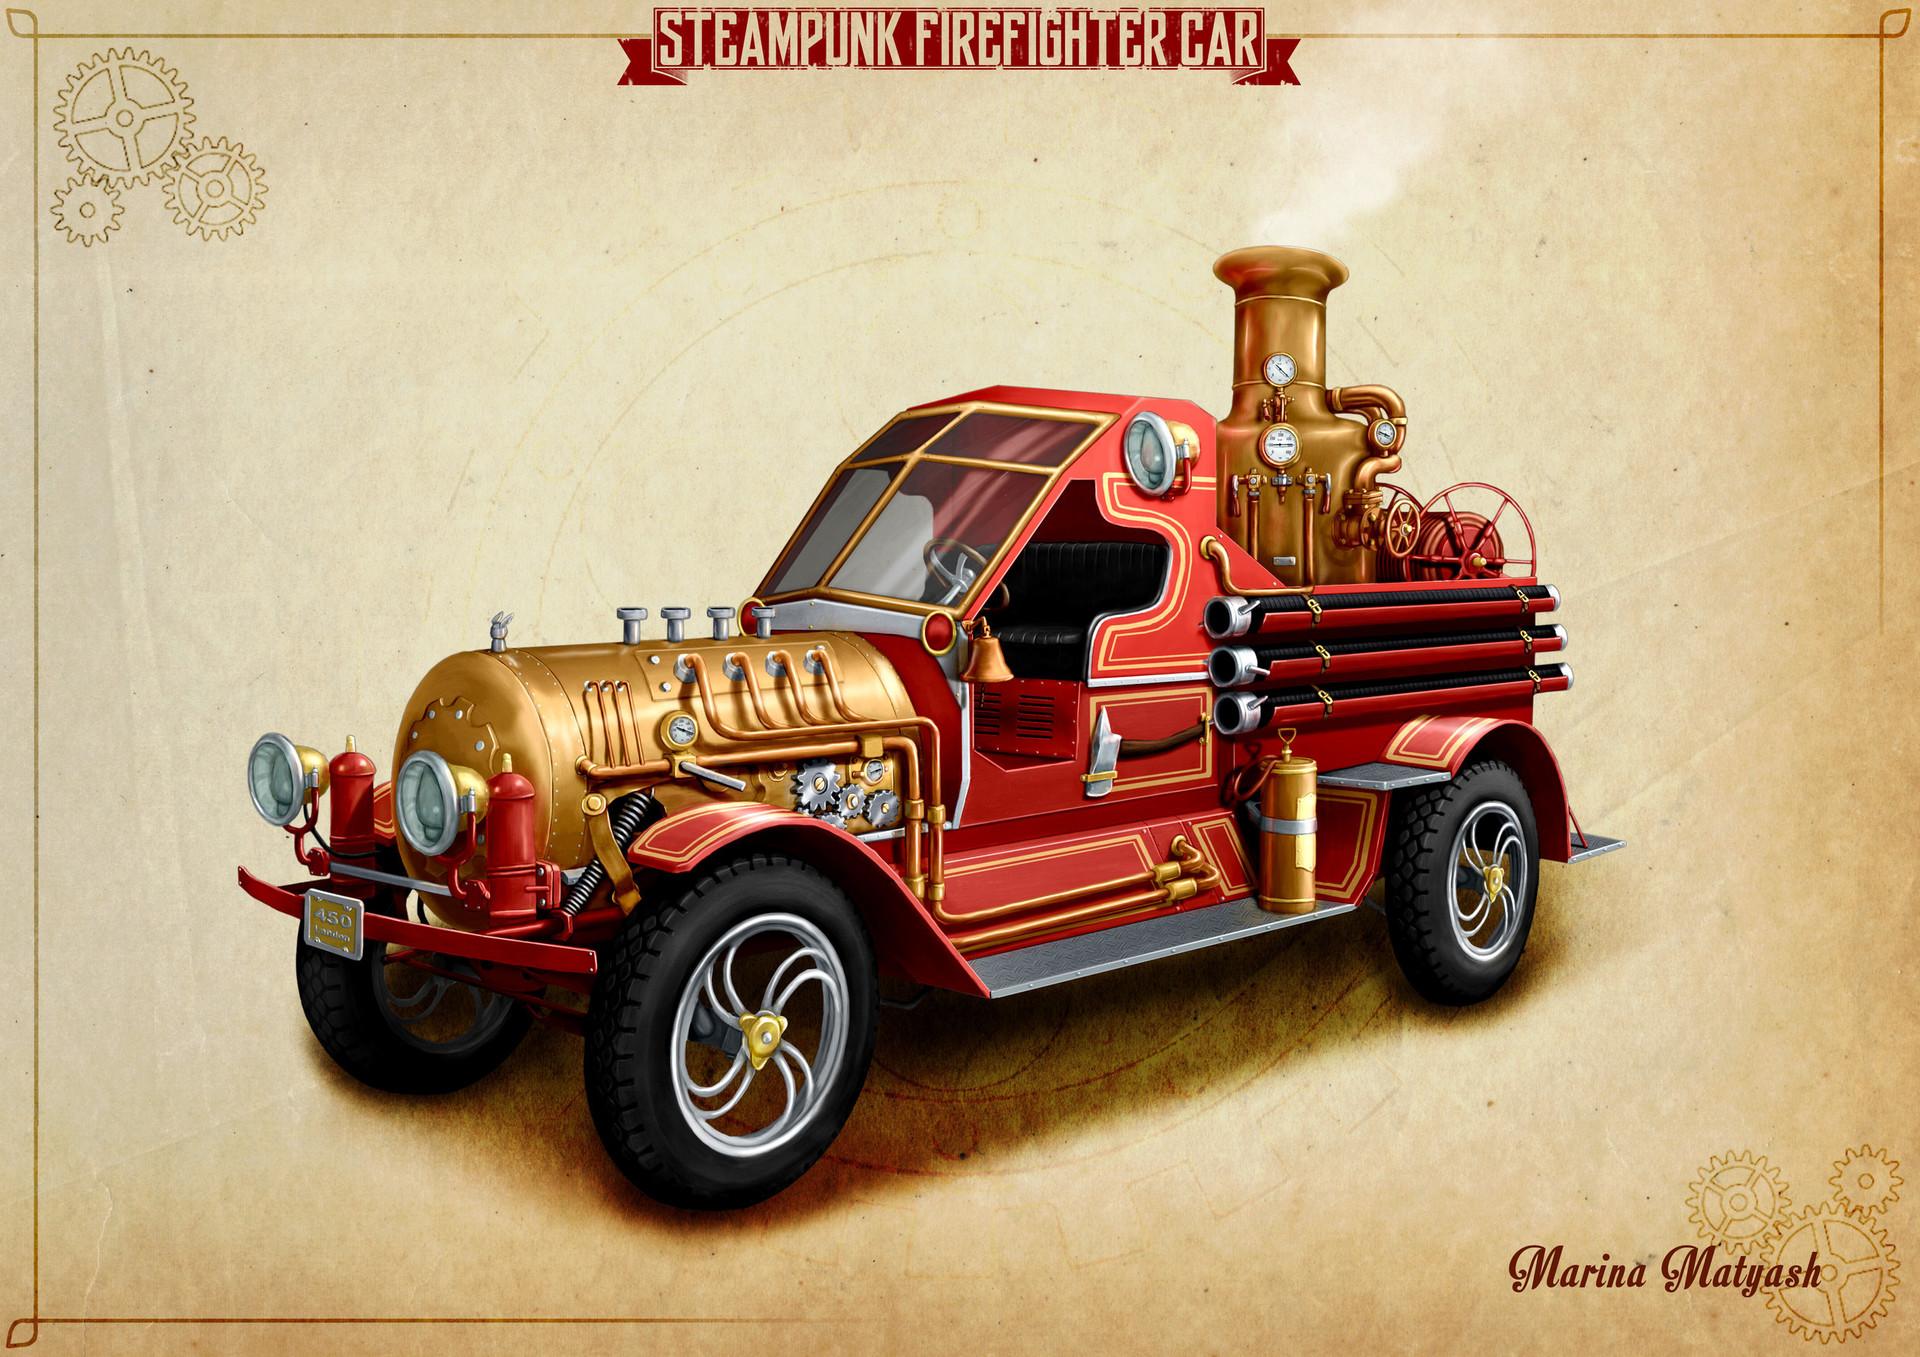 Steampunk Firecar